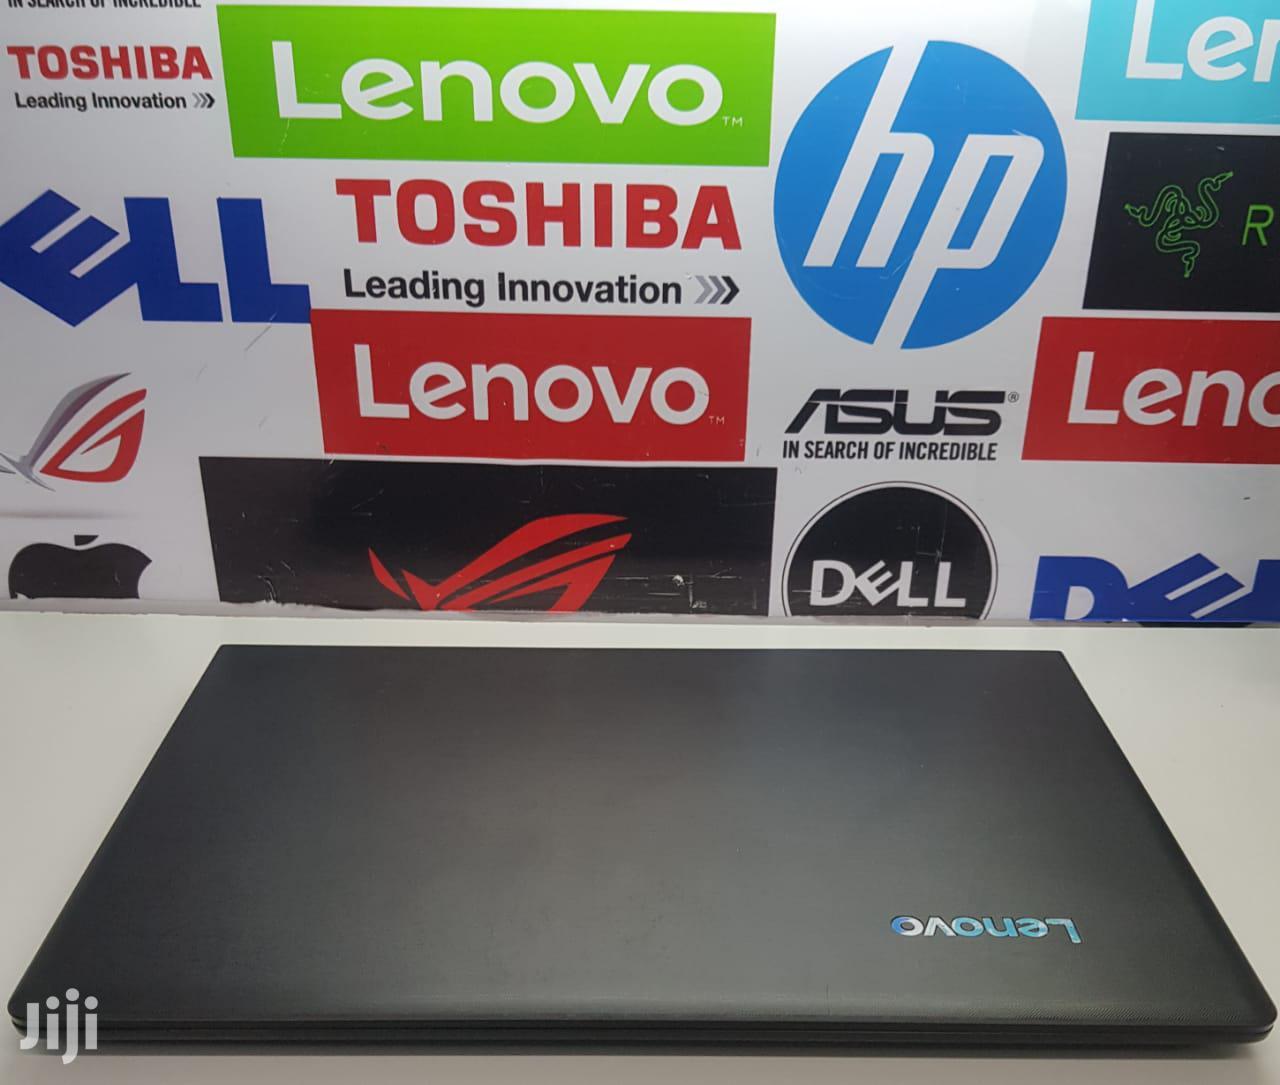 Laptop Lenovo IdeaPad 110 8GB Intel Core i5 HDD 1T | Laptops & Computers for sale in Nairobi Central, Nairobi, Kenya